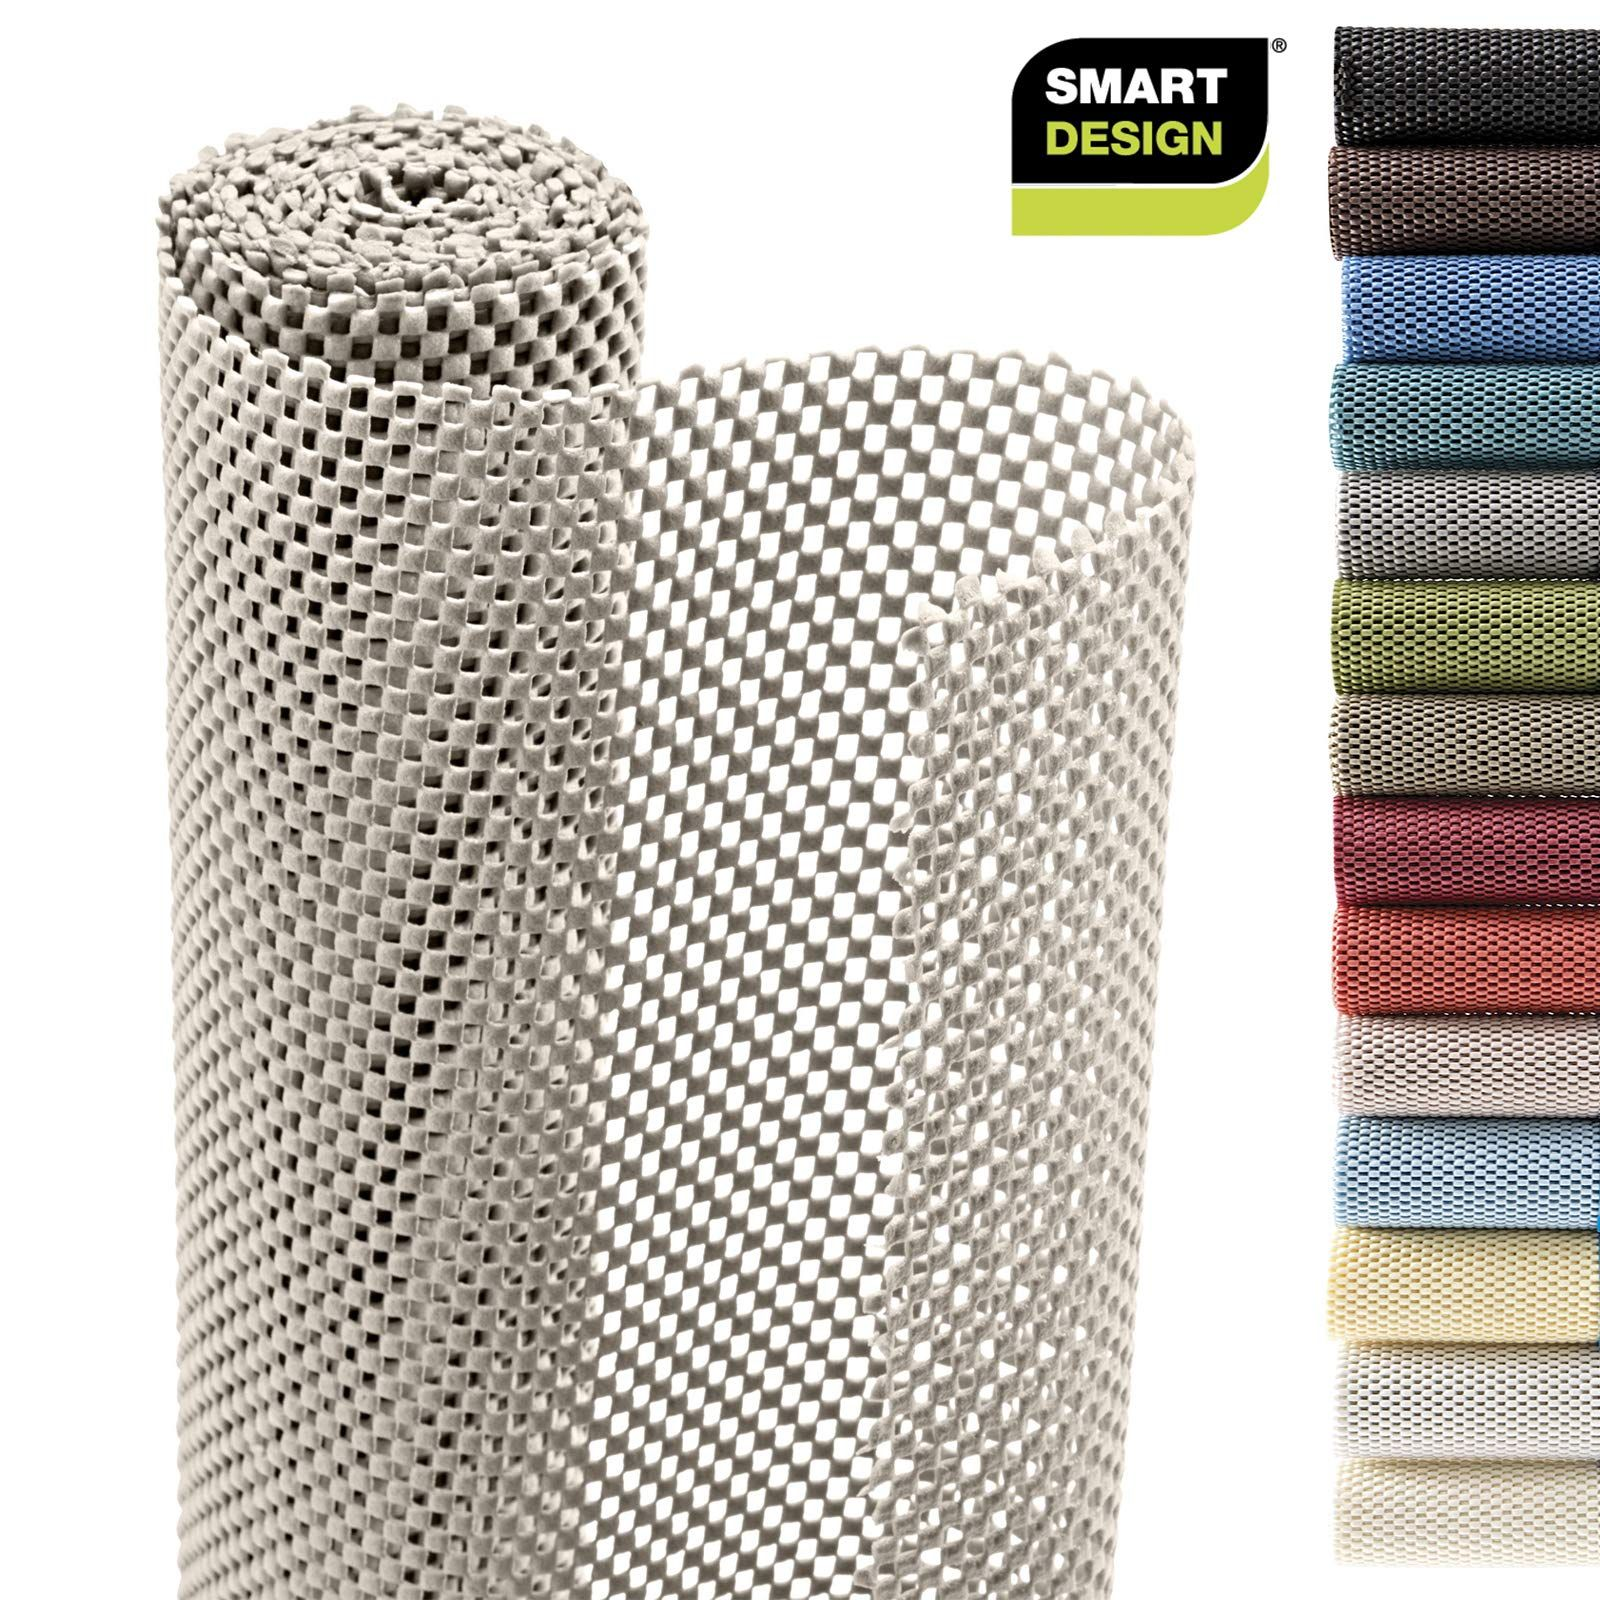 Smart Design Shelf Liner W Premium Grip Wipes Clean Cutable Material Non Slip Design For Shelves Drawers Flat Surfac In 2020 Drawer Liner Shelf Liner Drawers